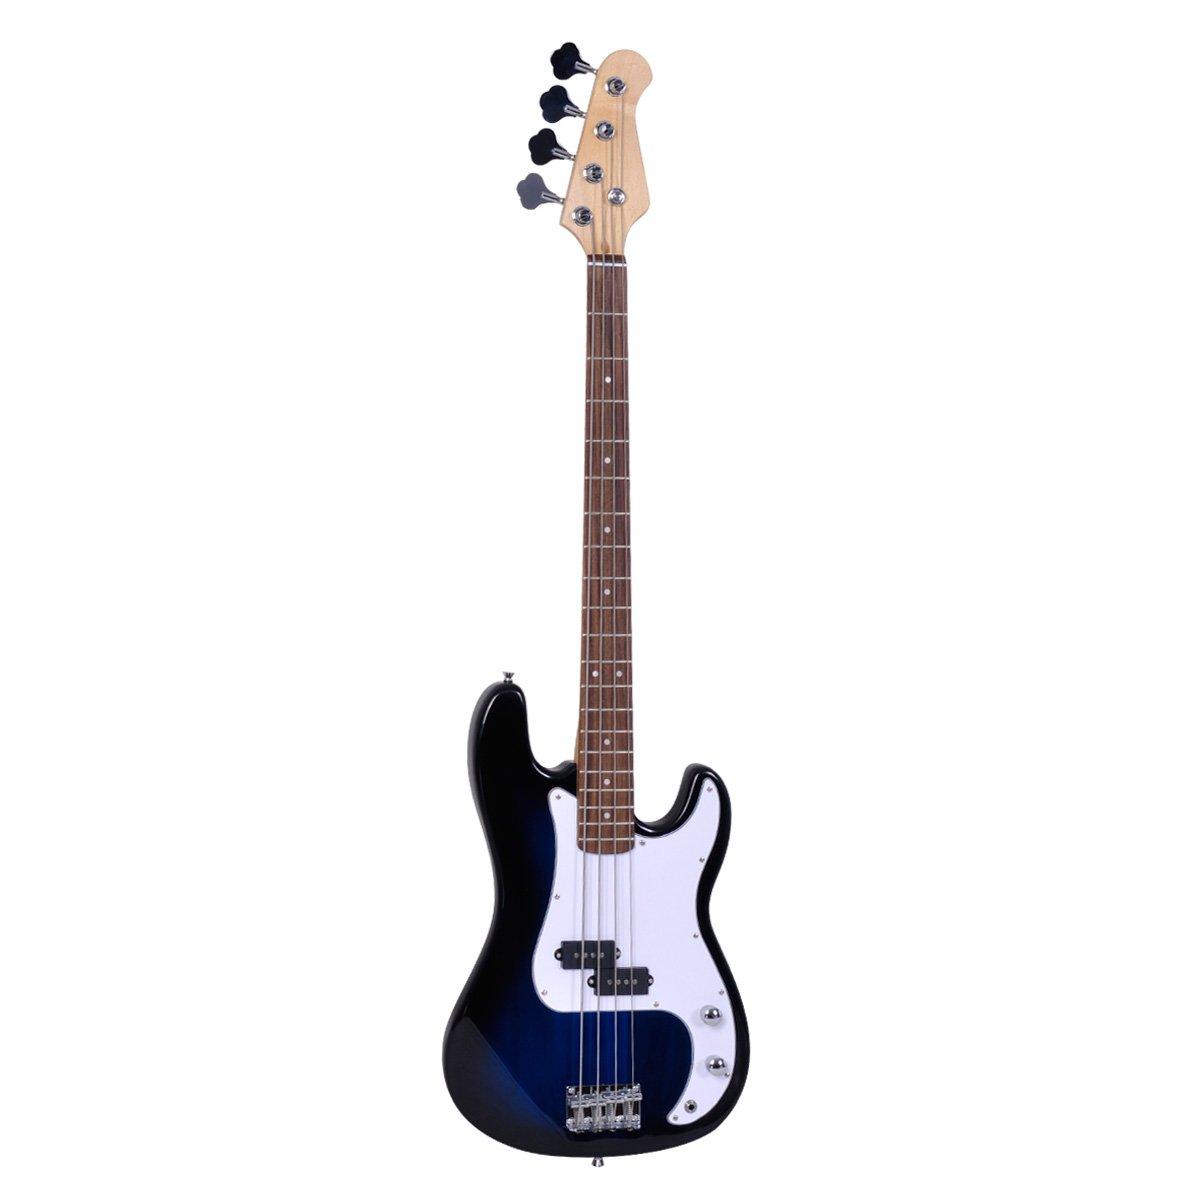 Polar Aurora NEW Full Size 4 Strings Blue Electric Bass Guitar+ Amp Cord+ Gigbag loongstarinc GF30182